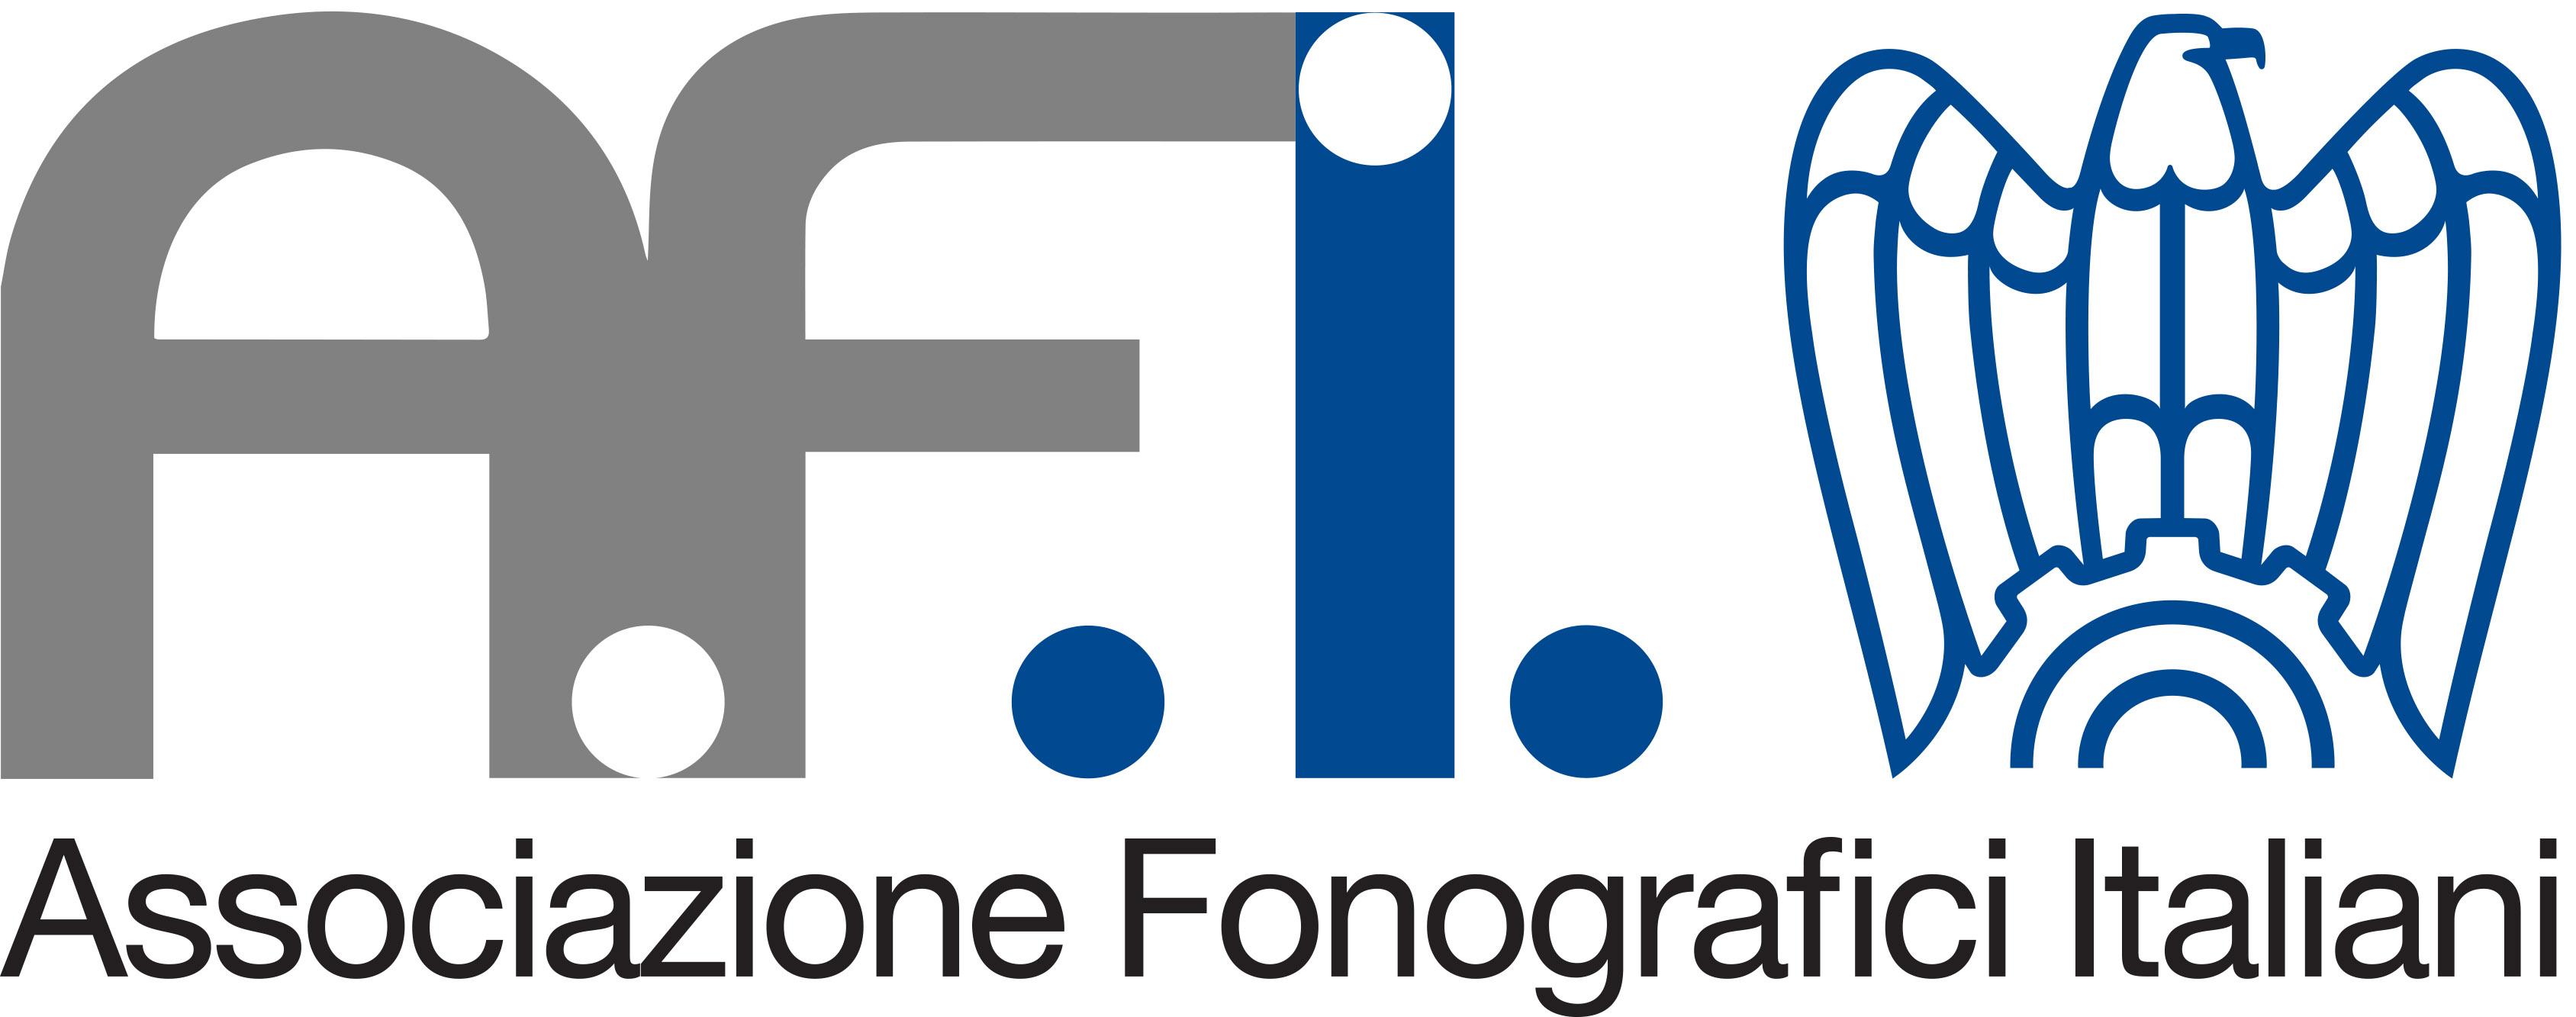 AFI Associazione Fonografici Italiani